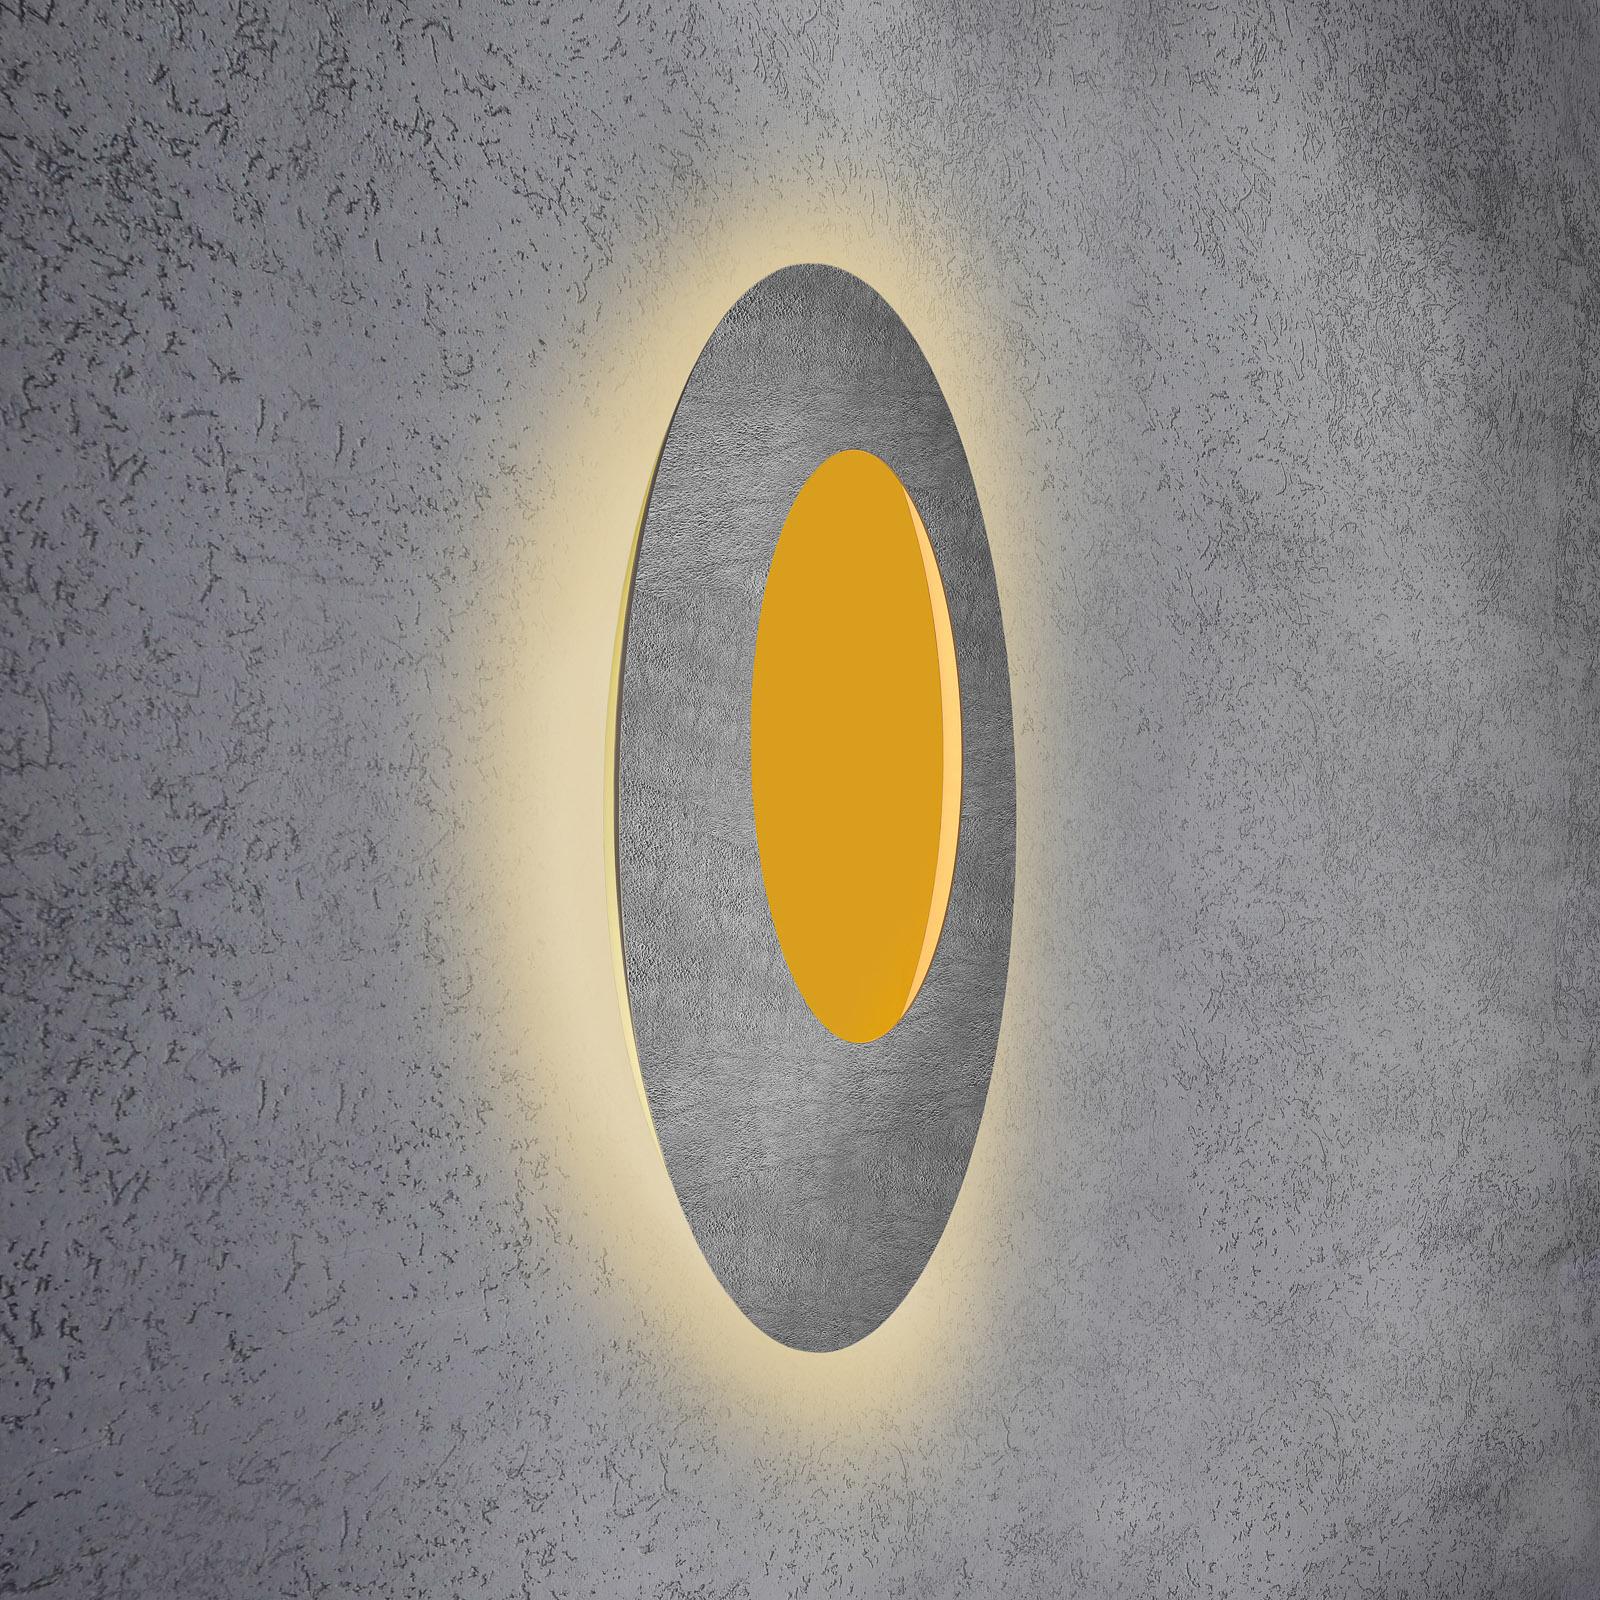 Escale Blade Open LED-vegglampe RGB+W betong Ø79cm